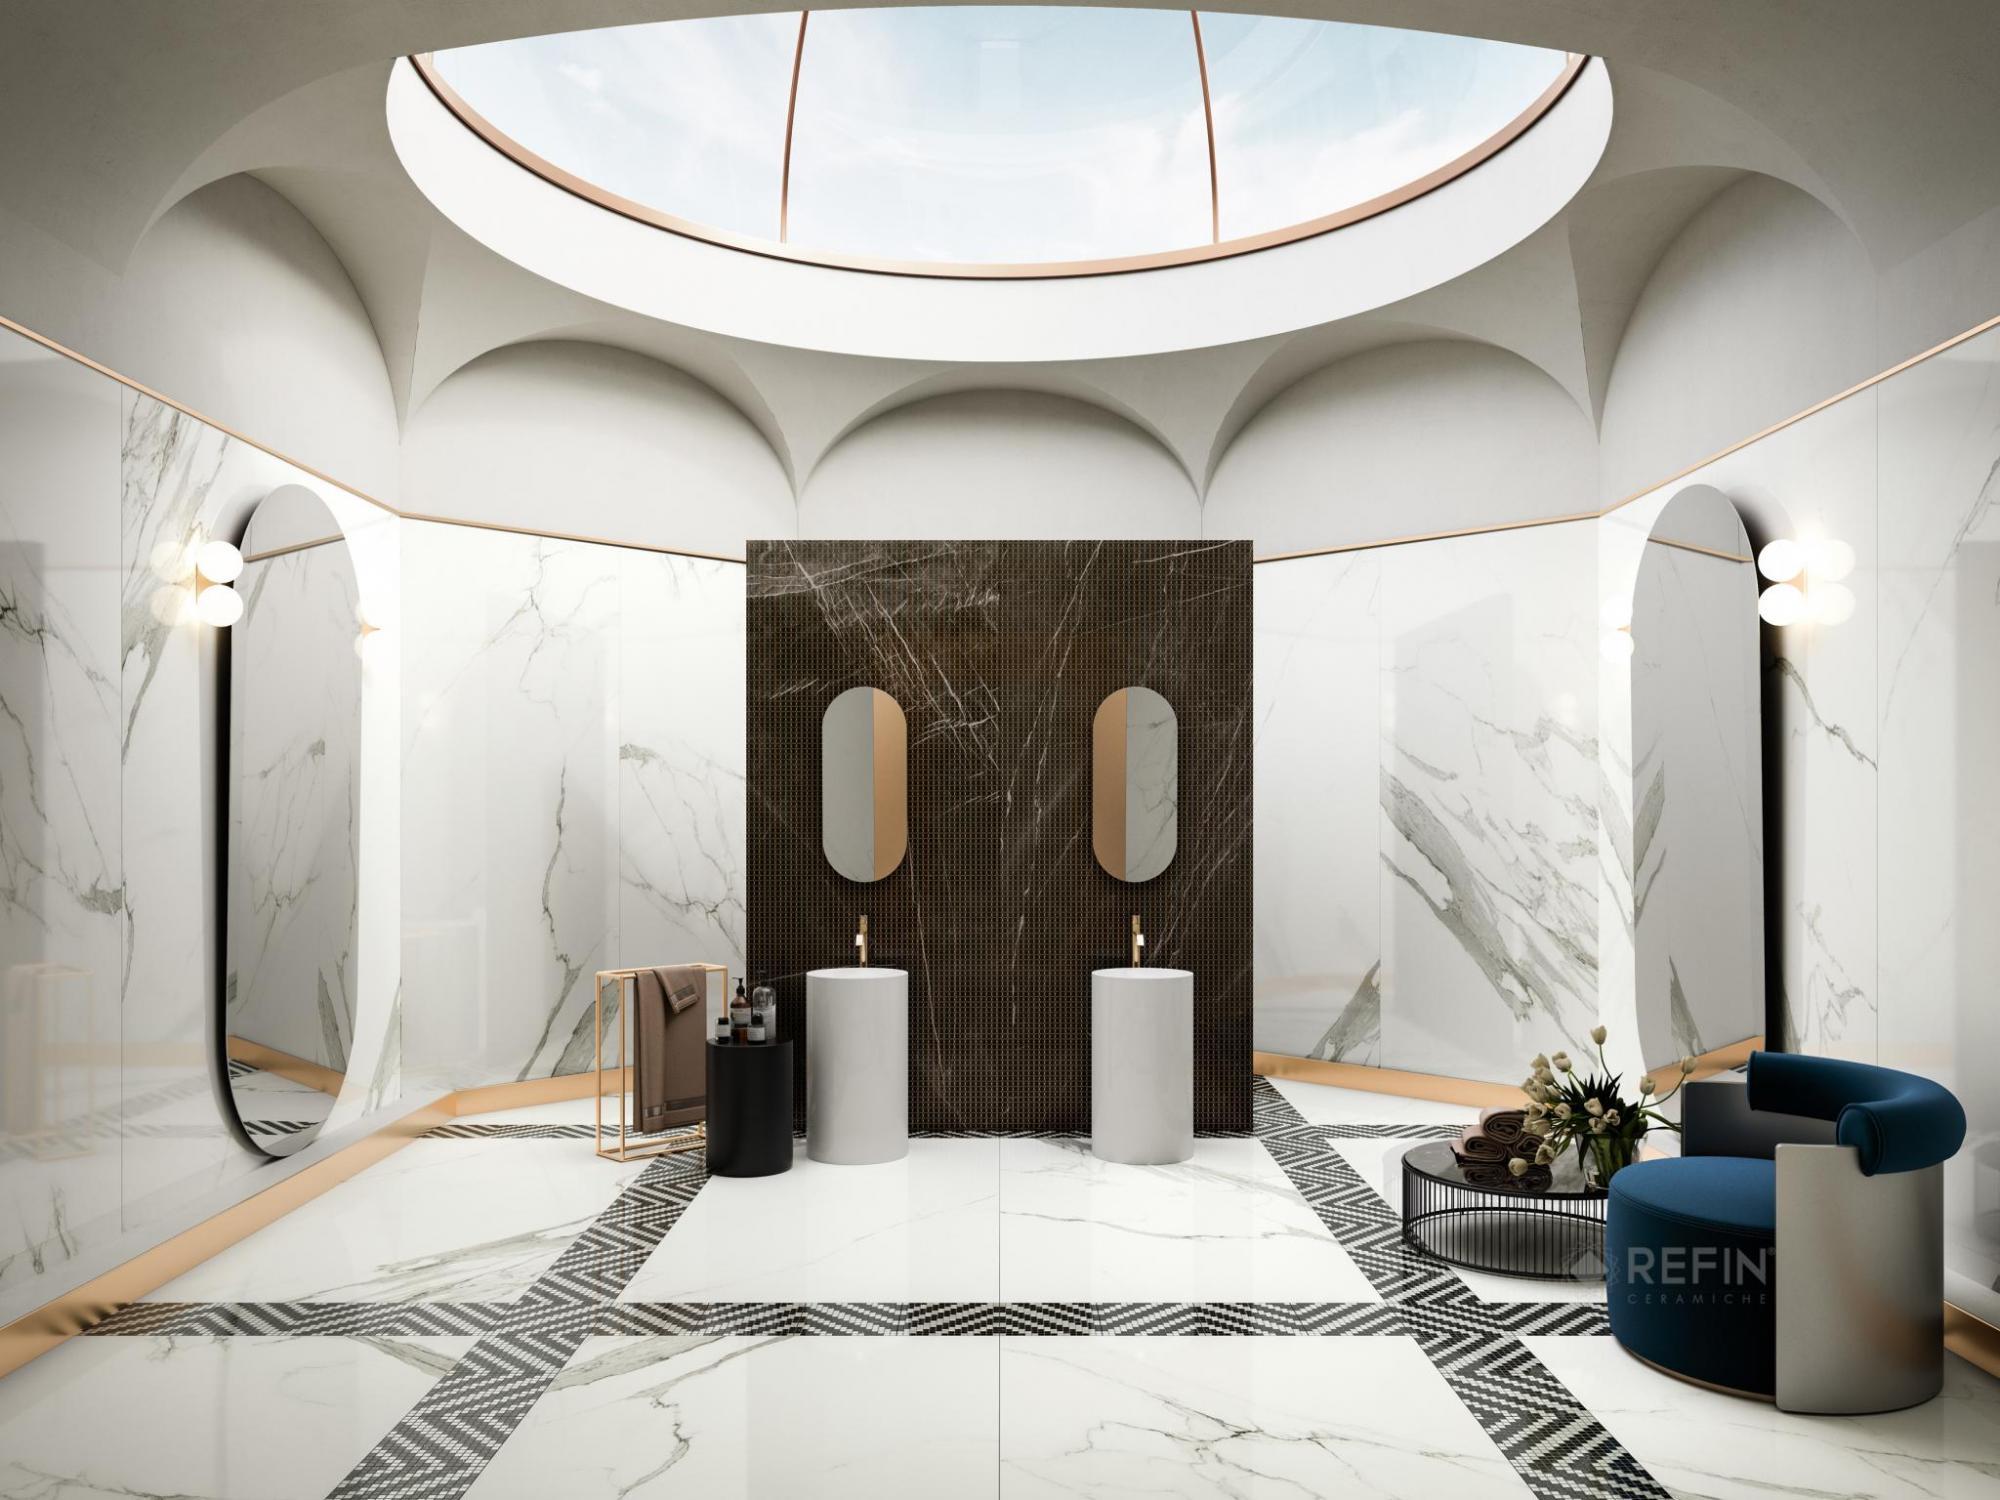 Renovate Your Bathroom with Luxury Bathroom Wall Tiles.